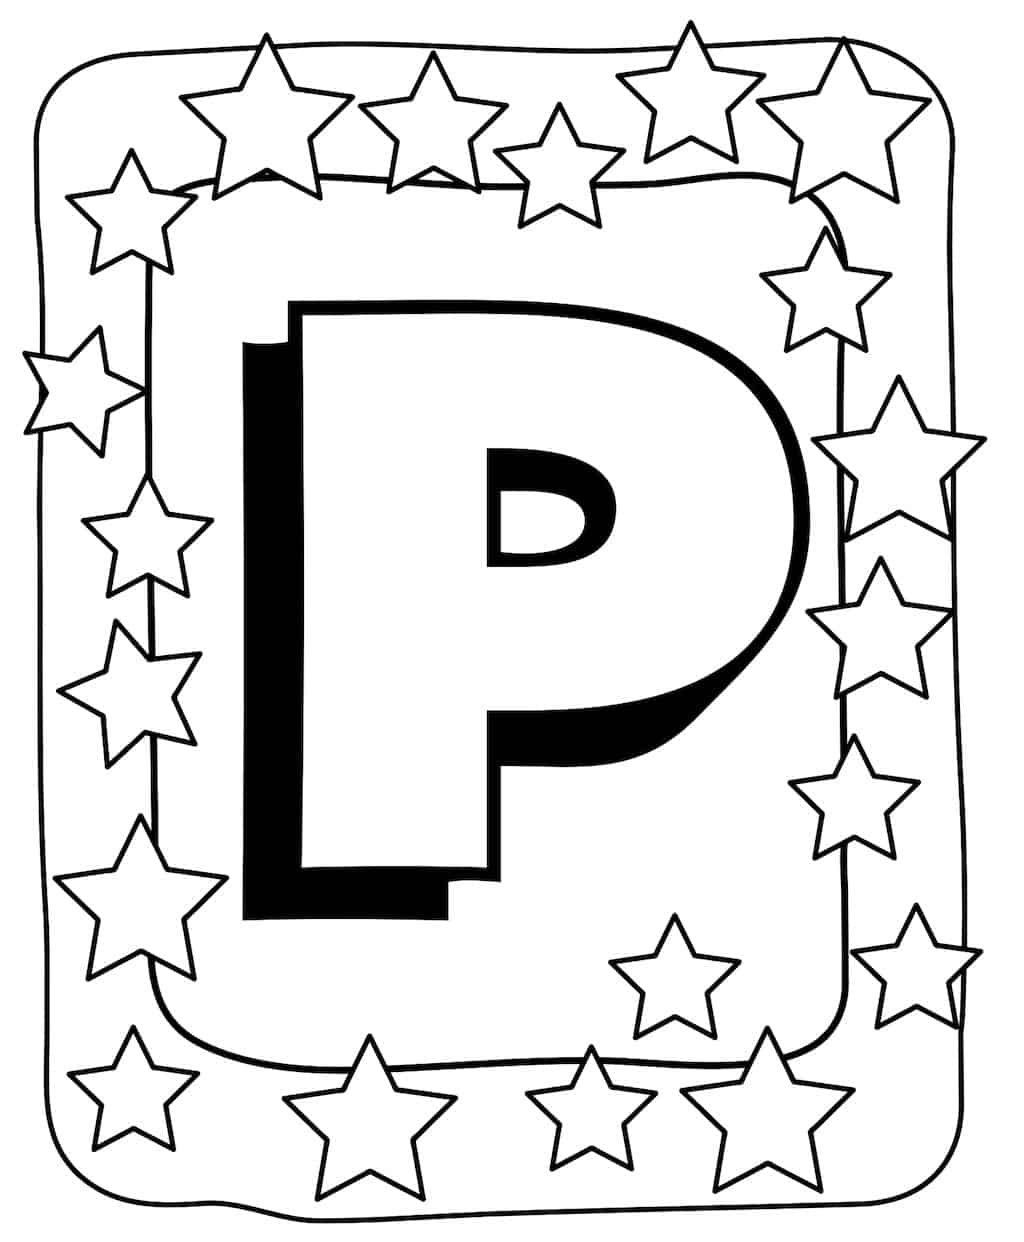 Kleurplaat Letter P 2 Topkleurplaat Nl